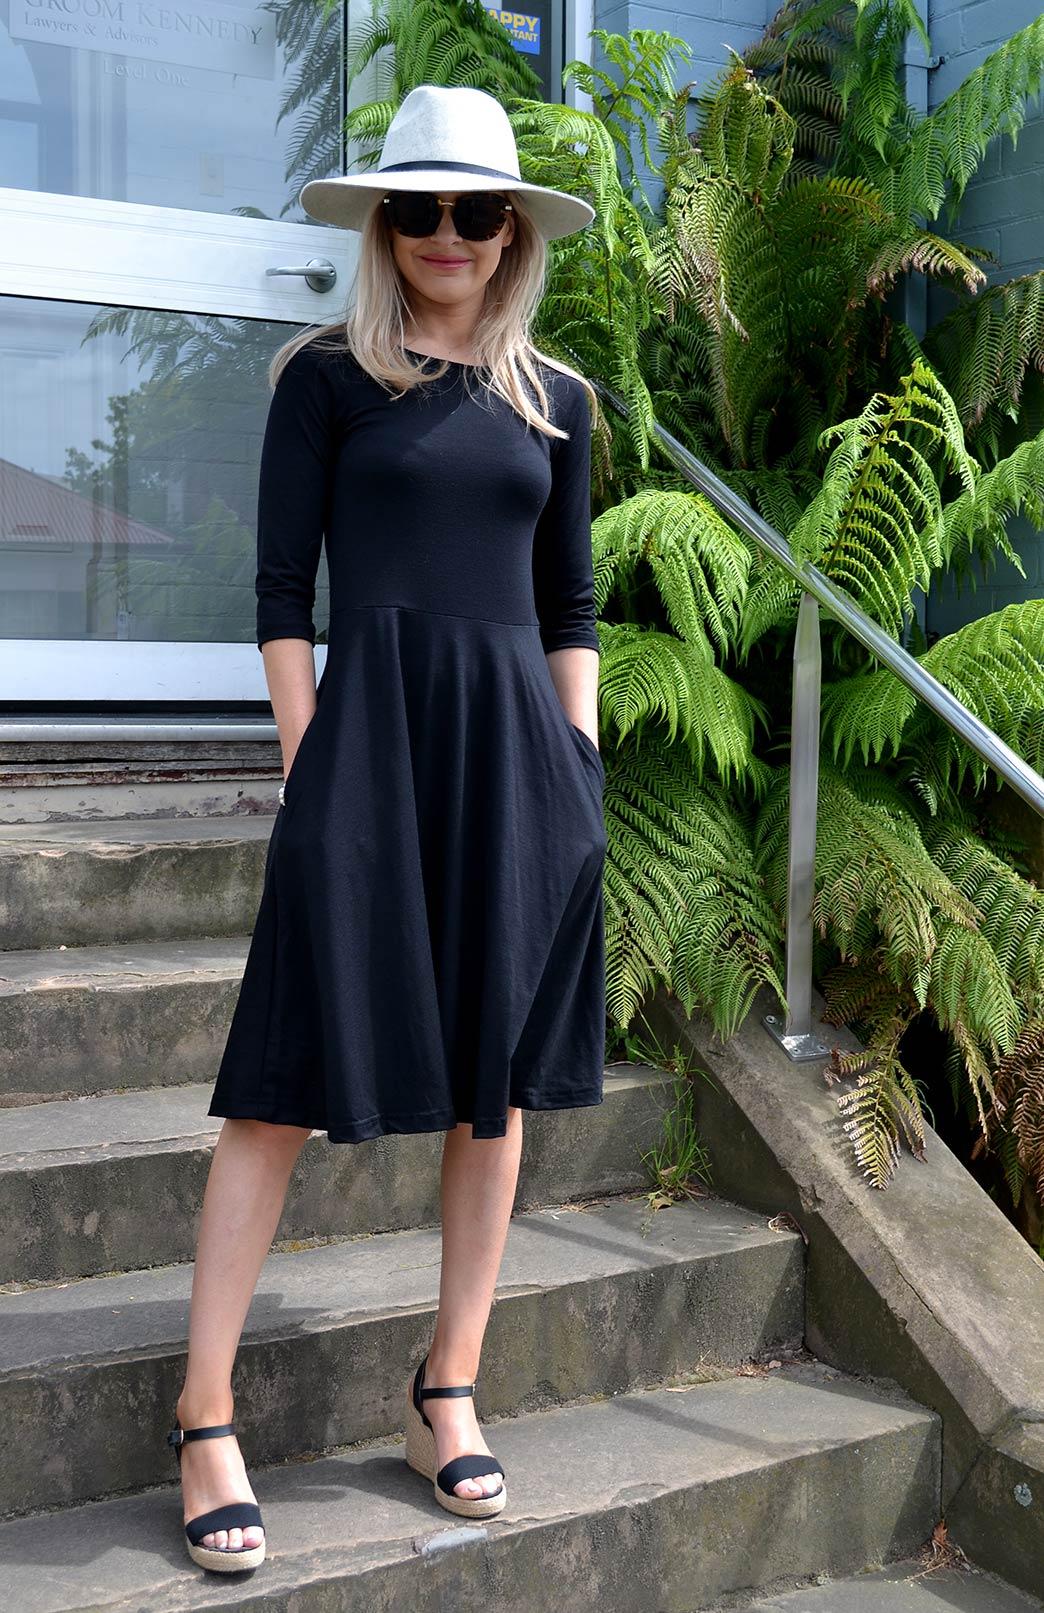 Mary Dress - Women's Black Knee Length 3/4 Sleeved Fit and Flare Merino Wool Dress with Pockets - Smitten Merino Tasmania Australia